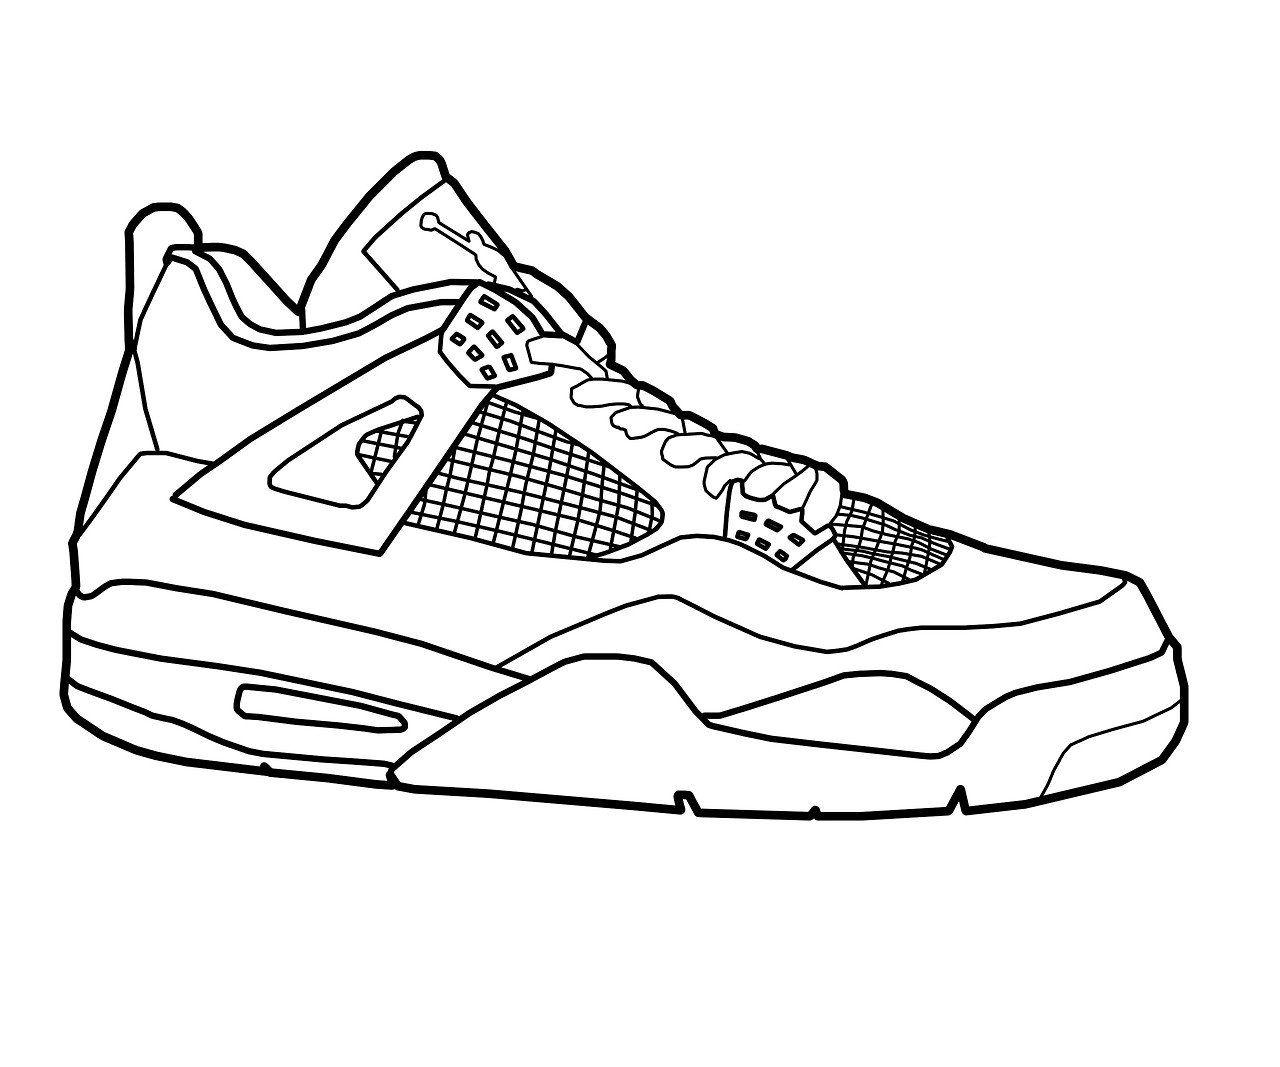 Jordan Shoe Coloring Book Lovely Jordan Shoe Drawing At Paintingvalley Sneakers Drawing Pictures Of Jordans Air Jordans